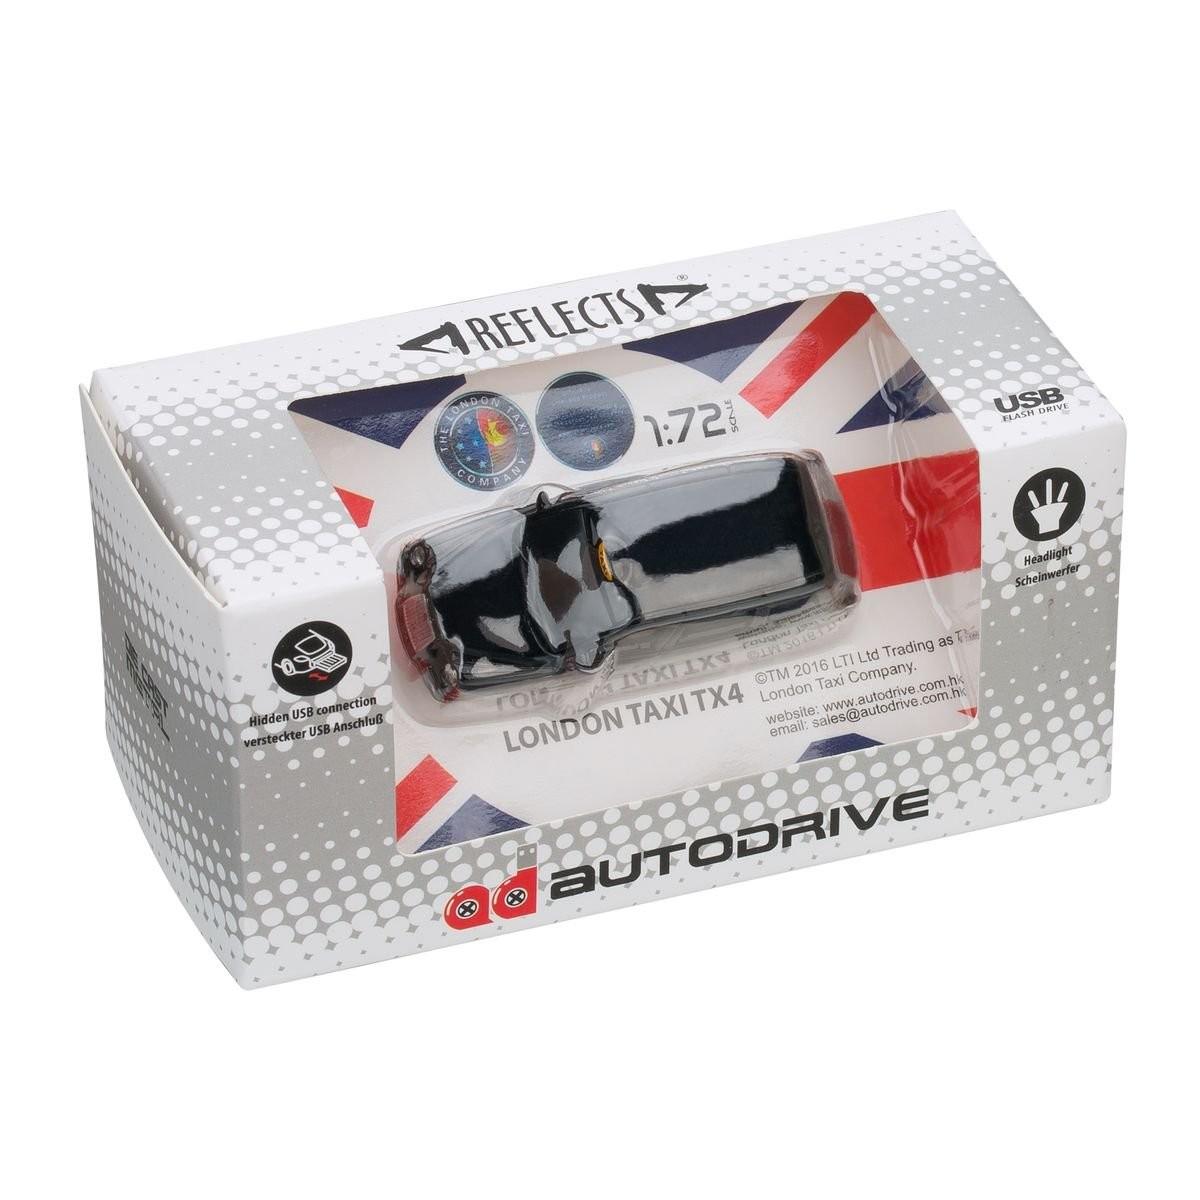 USB flash drive London Taxi TX4 1:72 BLACK 16GB, View 9